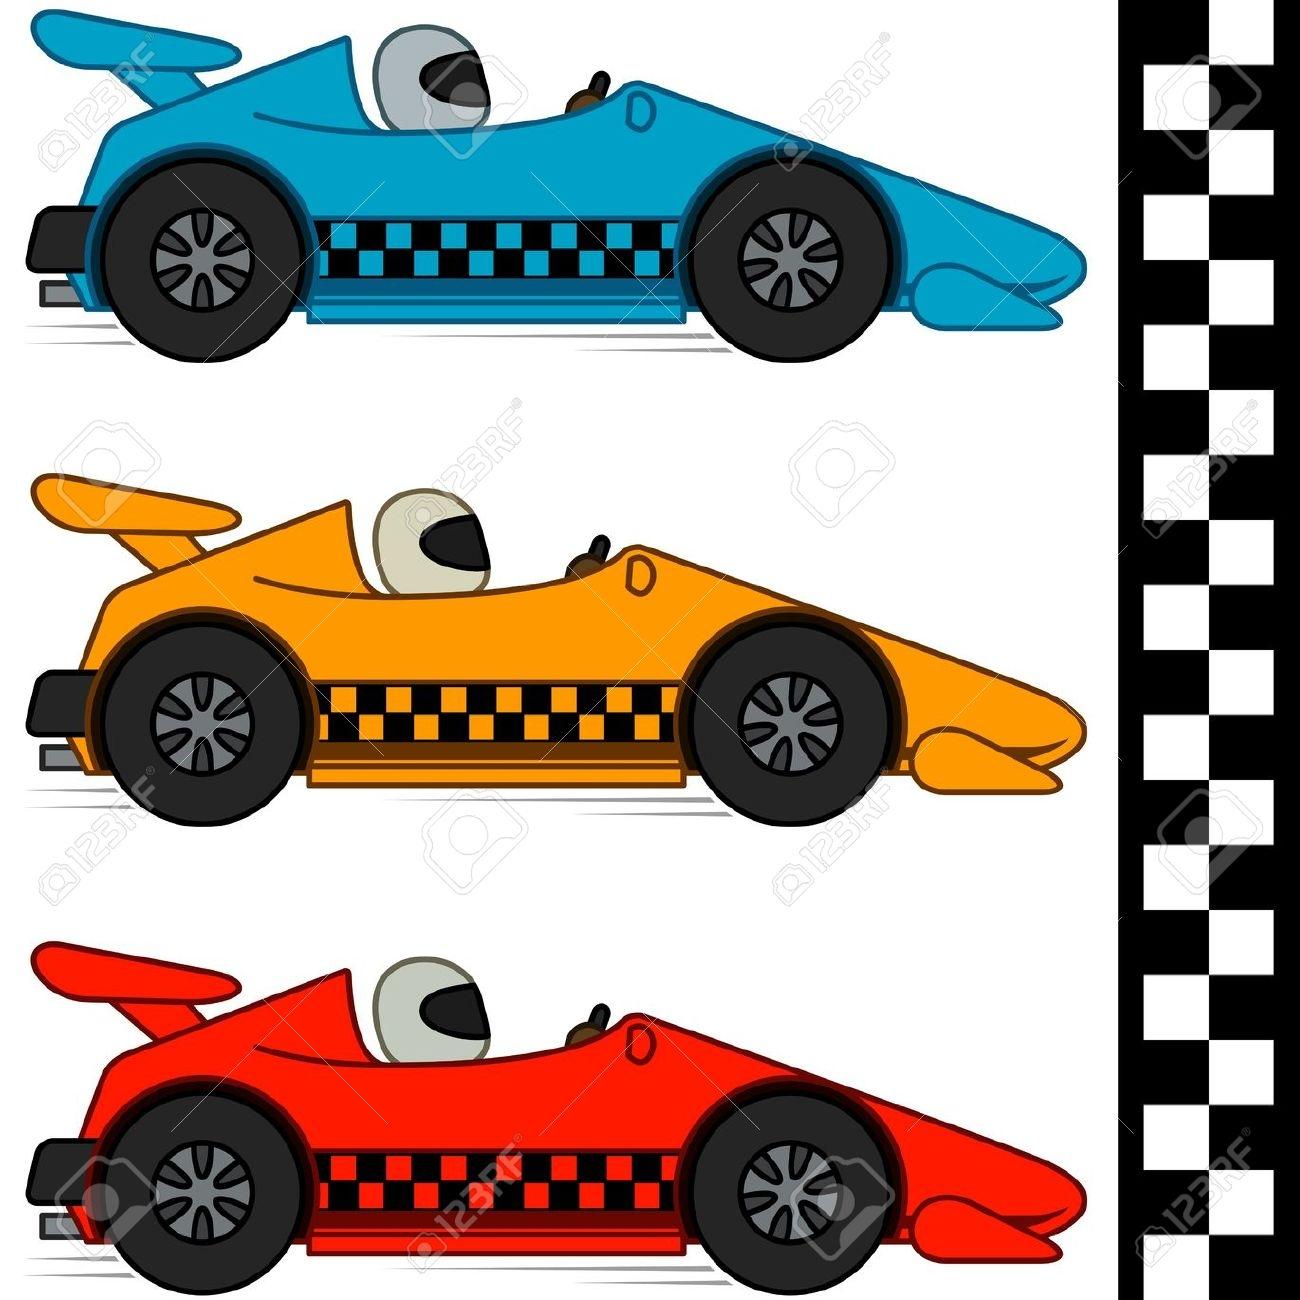 Stock Car Racing Clipart-Stock Car Racing Clipart-19